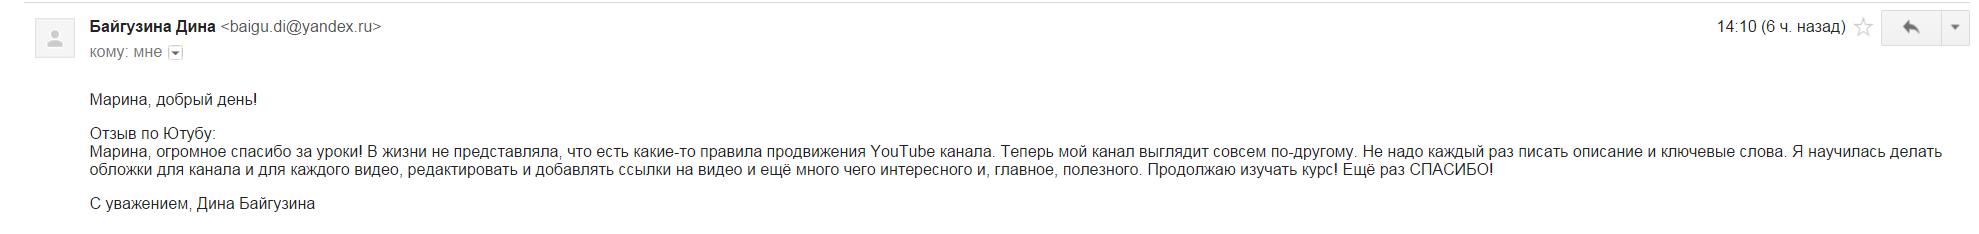 2015-08-13_20-15-55